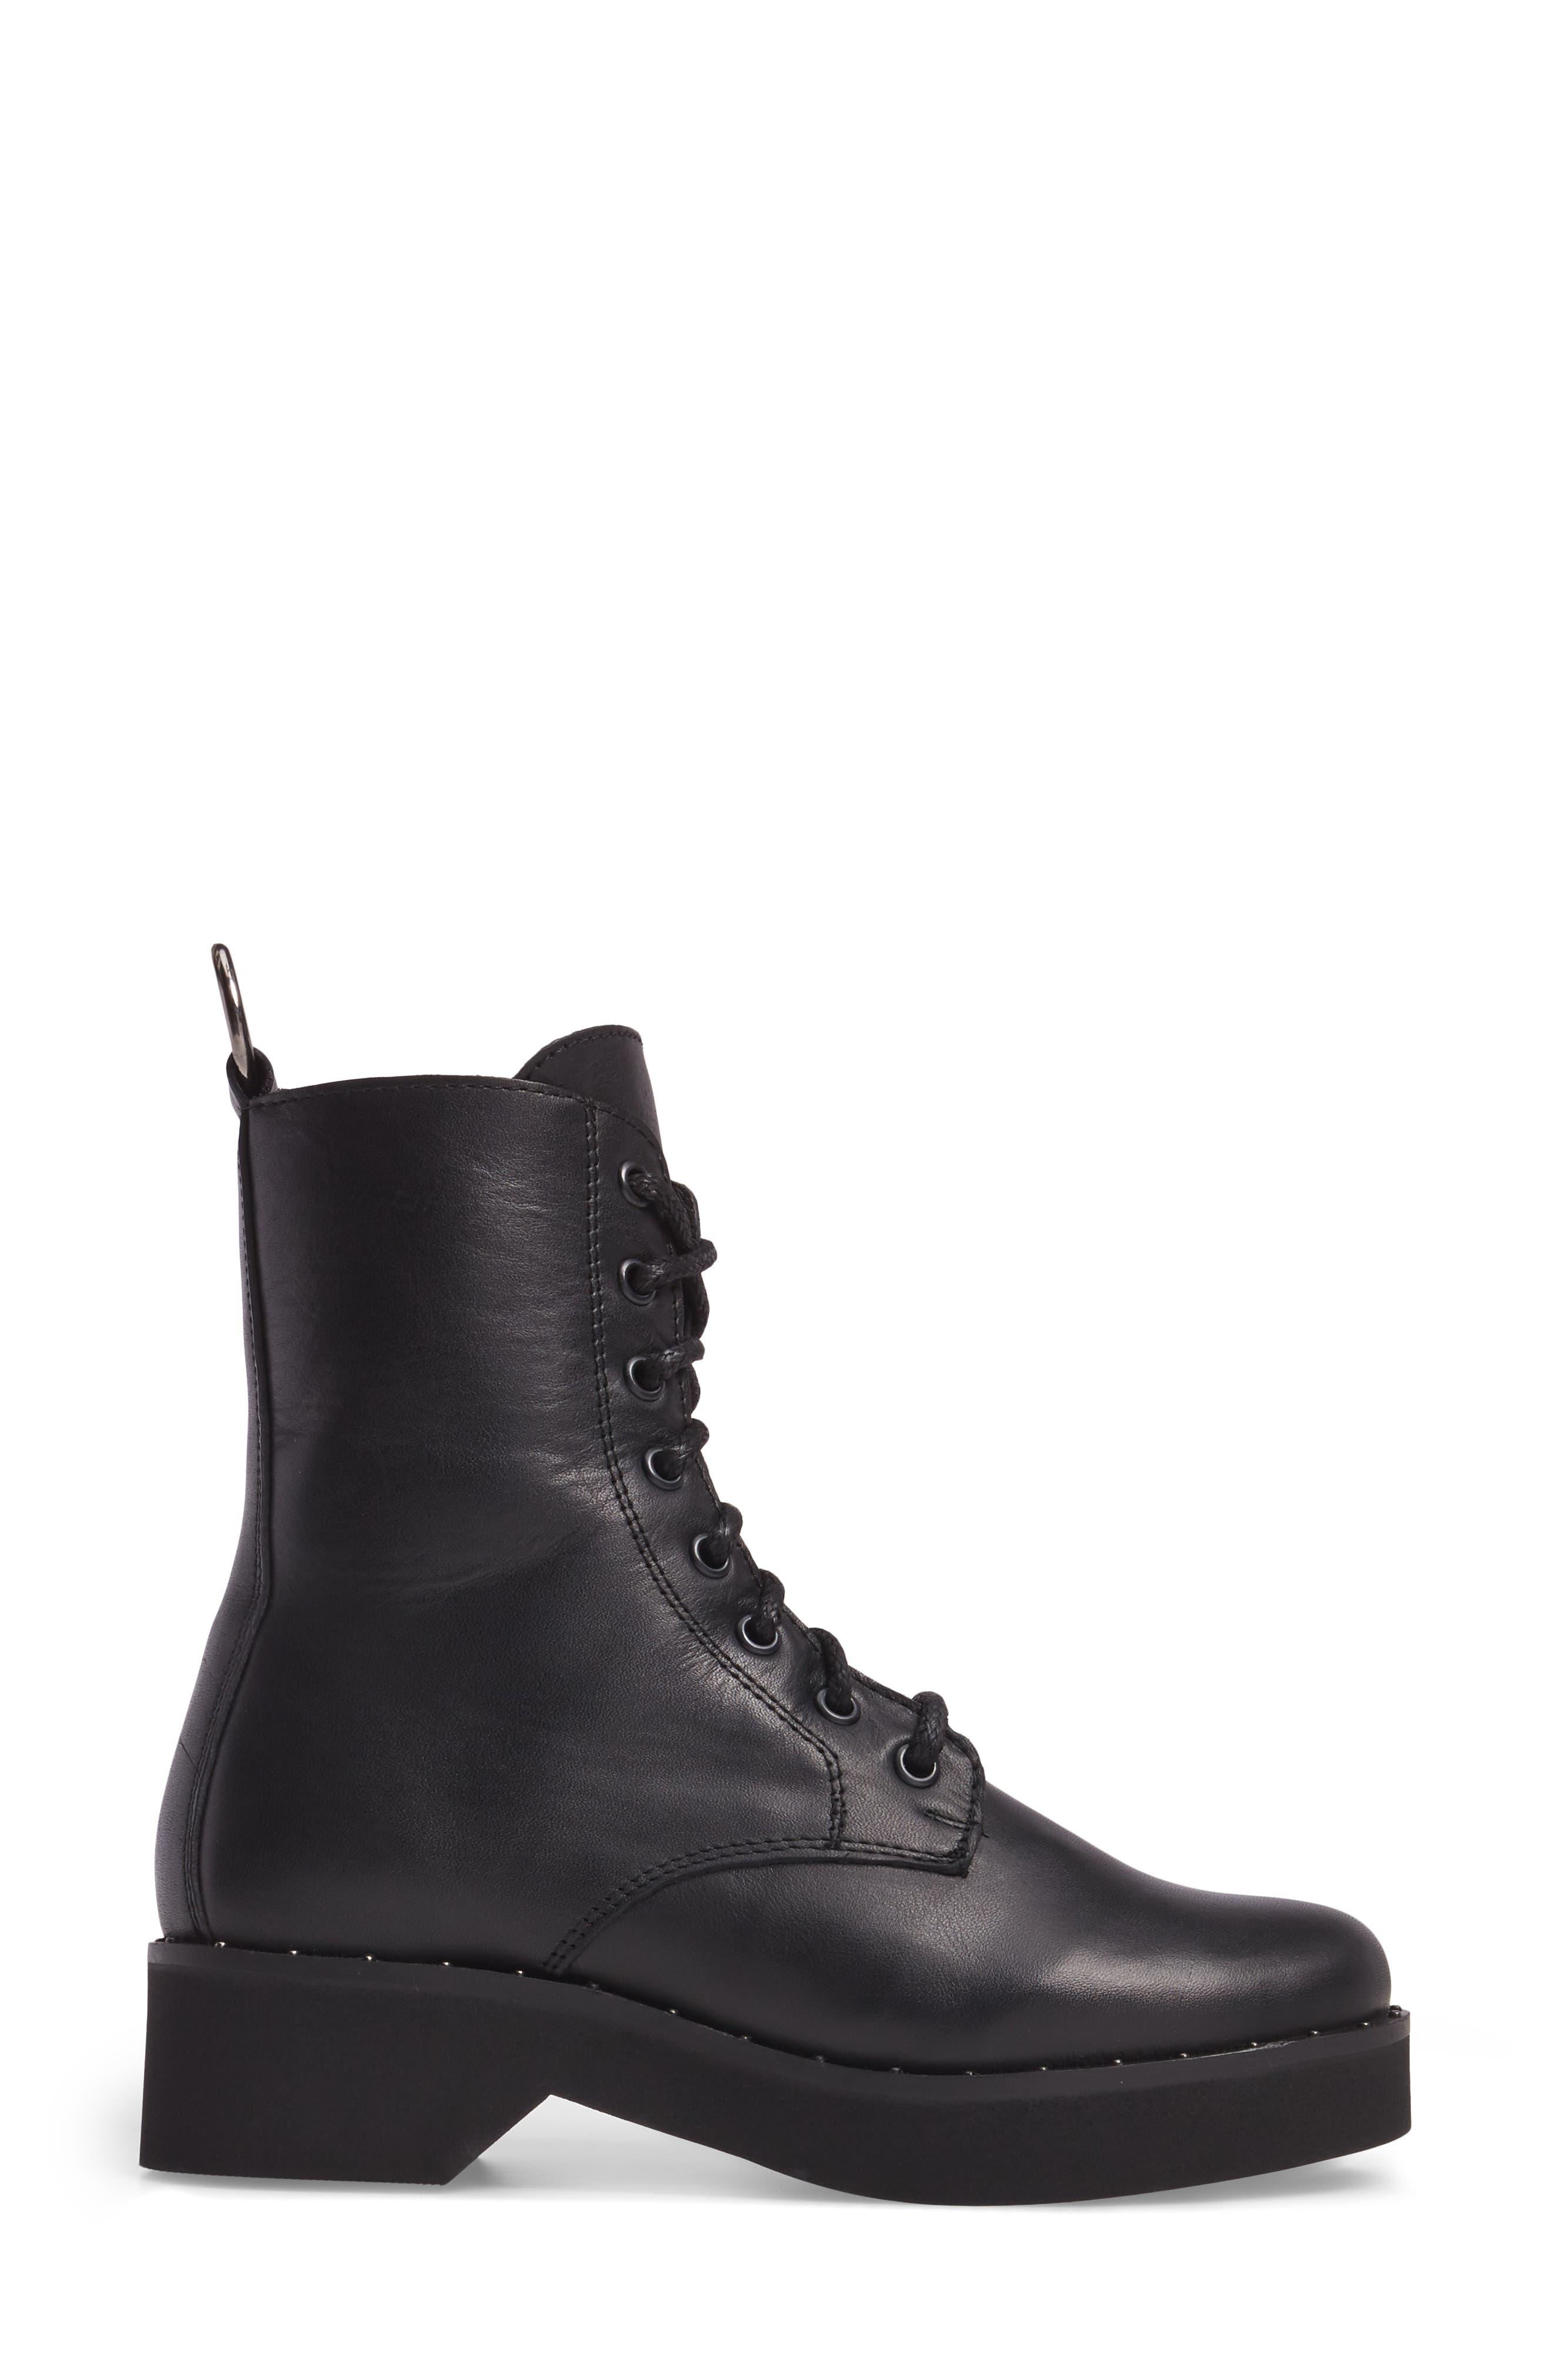 Rocco Combat Boot,                             Alternate thumbnail 3, color,                             Black Leather